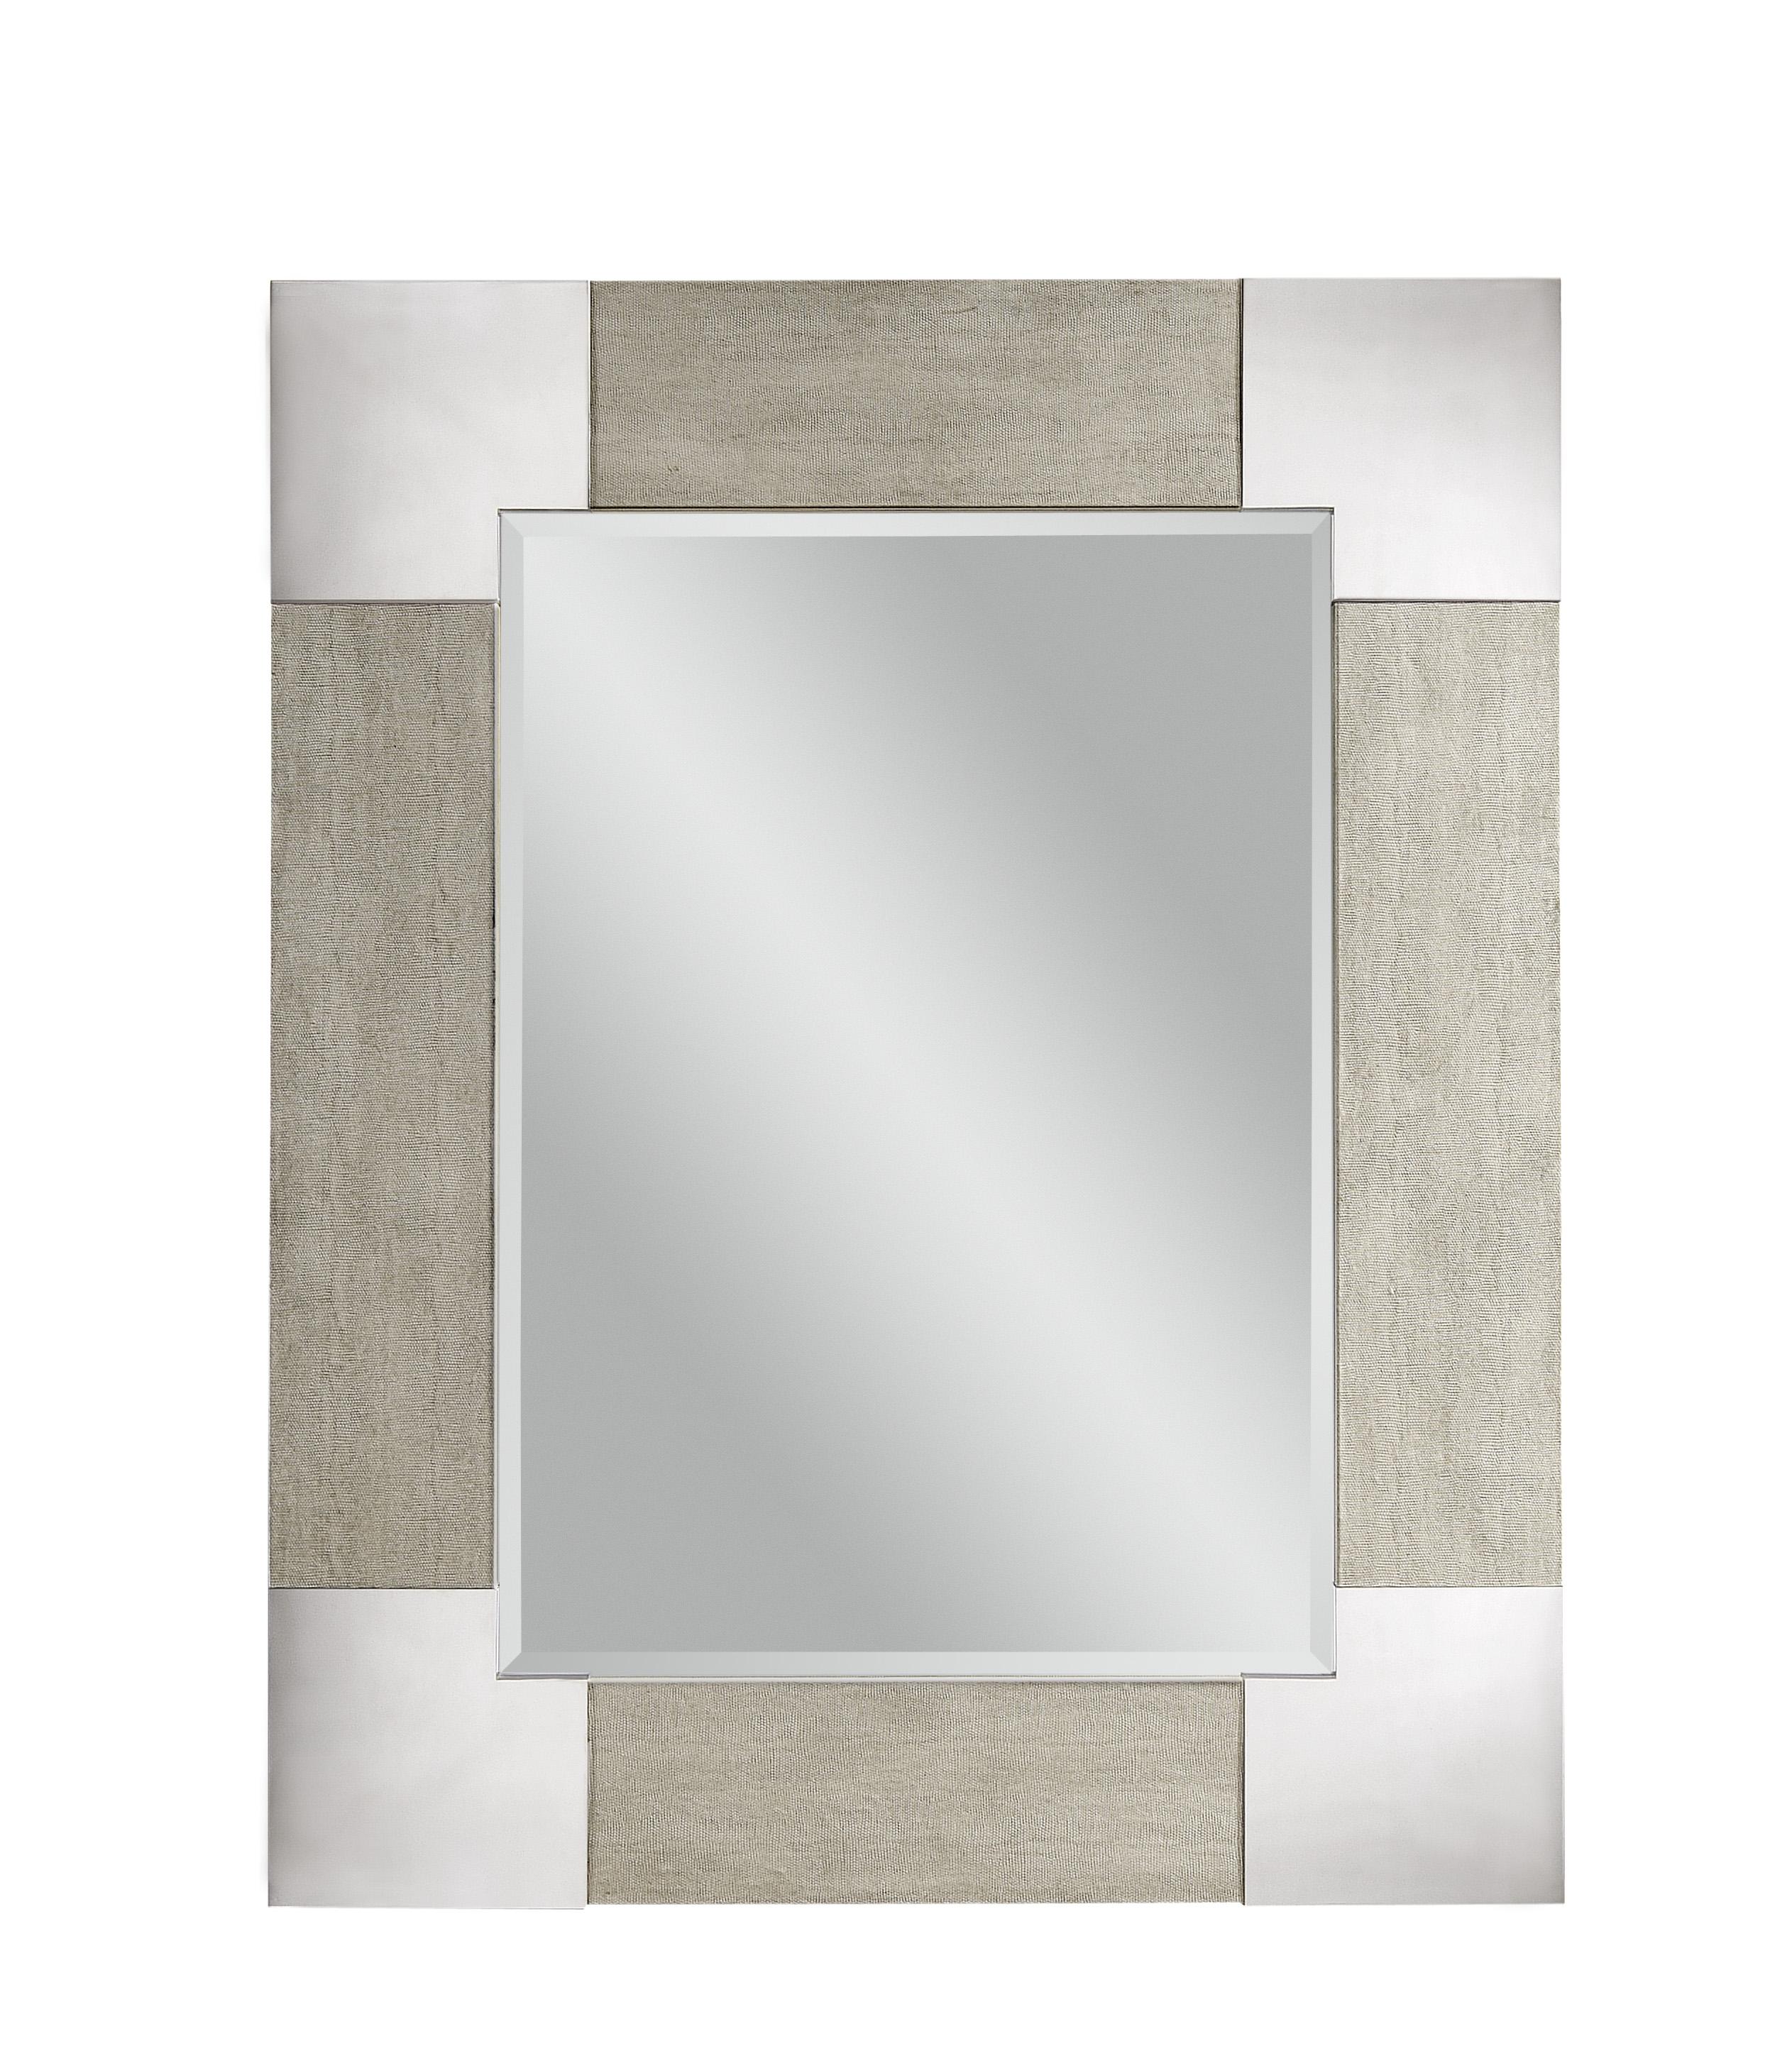 Thoroughly Modern Kipling Wall Mirror by Bassett Mirror at Alison Craig Home Furnishings